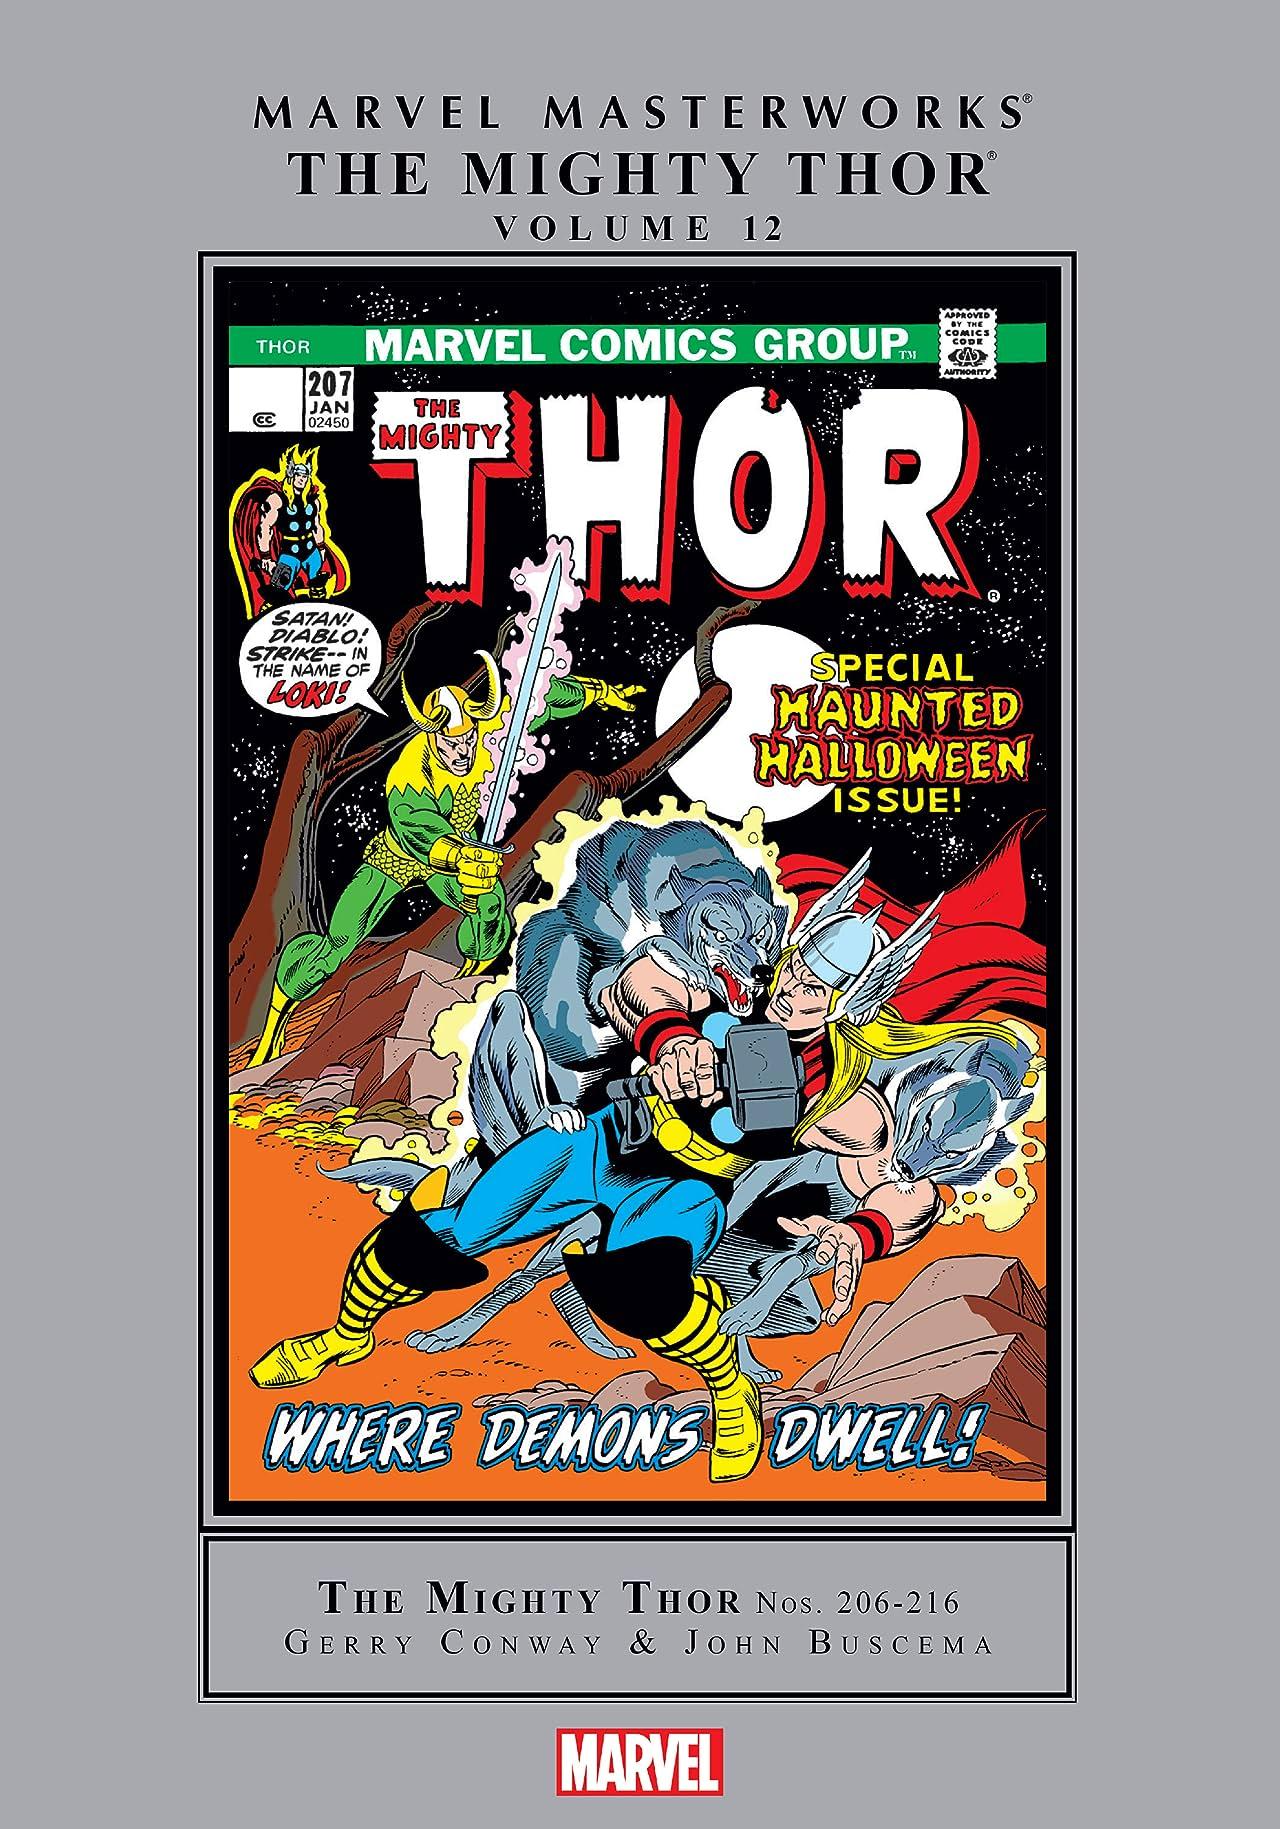 Thor Masterworks Vol. 12